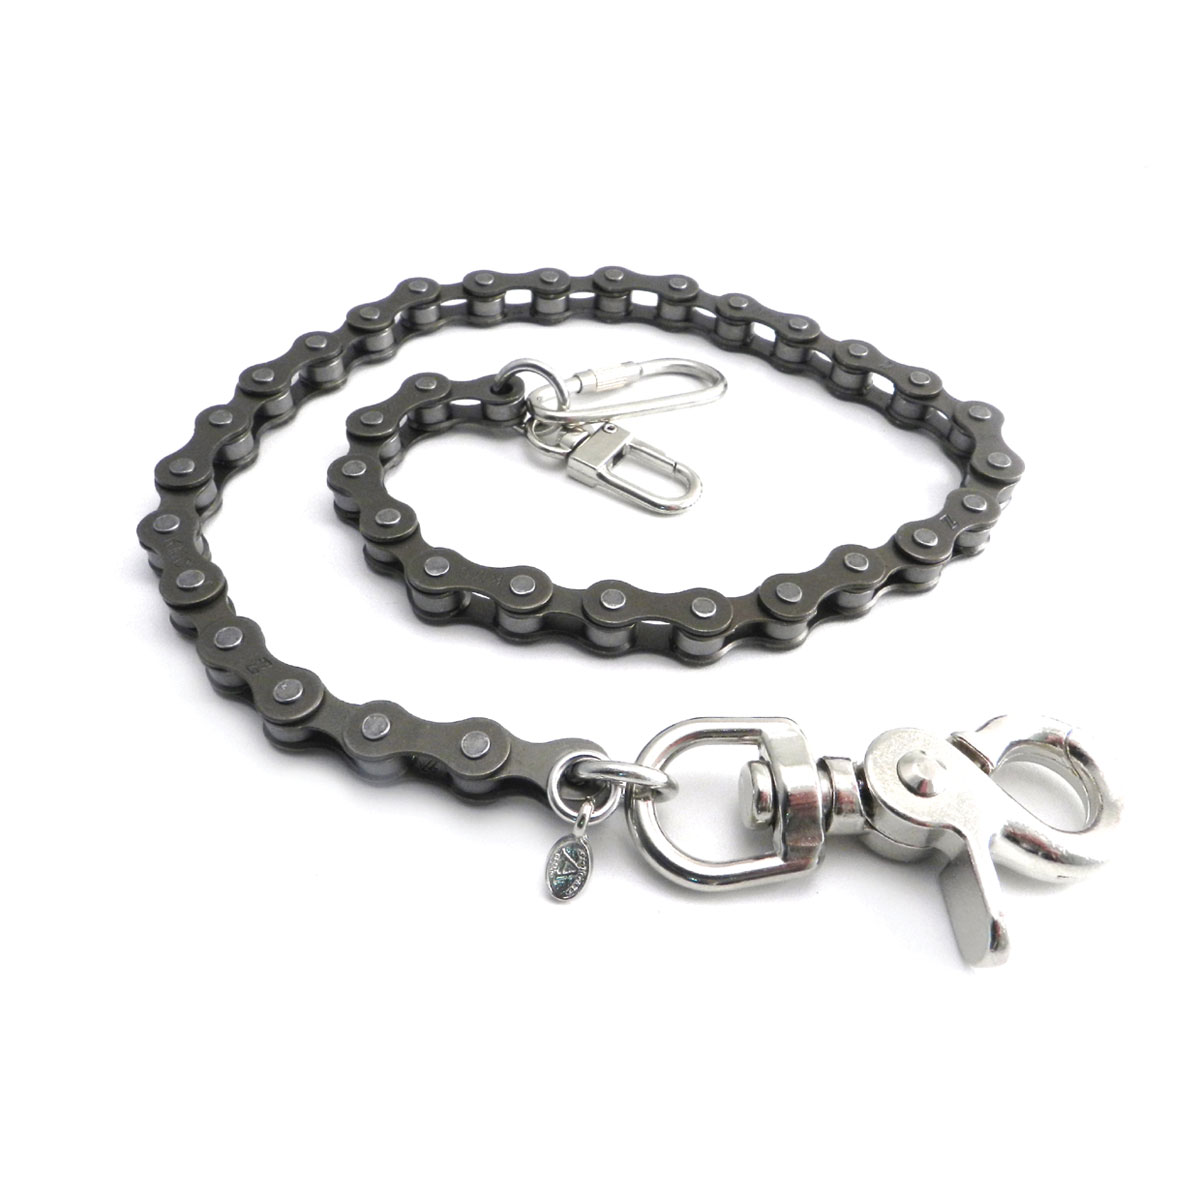 AMiGAZ Camo Bike Chain Wallet Chain